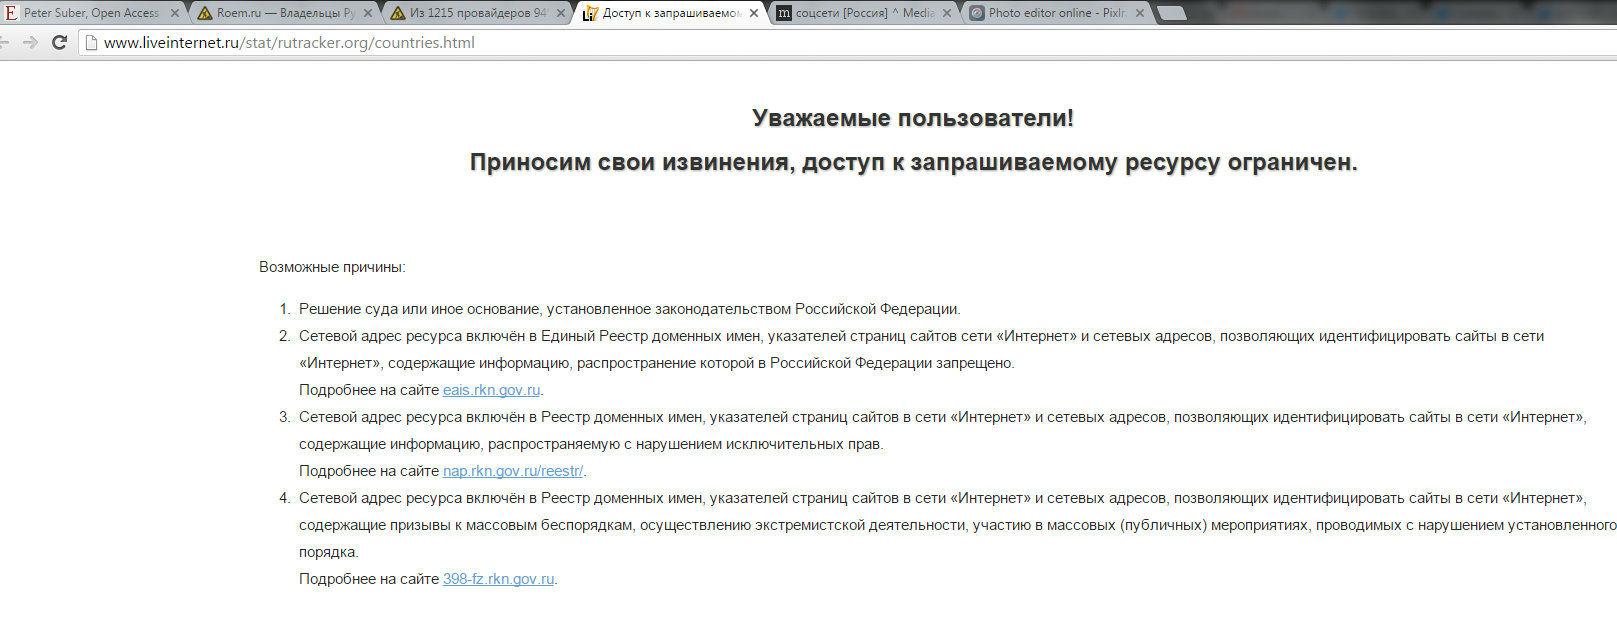 NetByNet ограничил доступ к Liveinternet.ru или к Rutracker.org